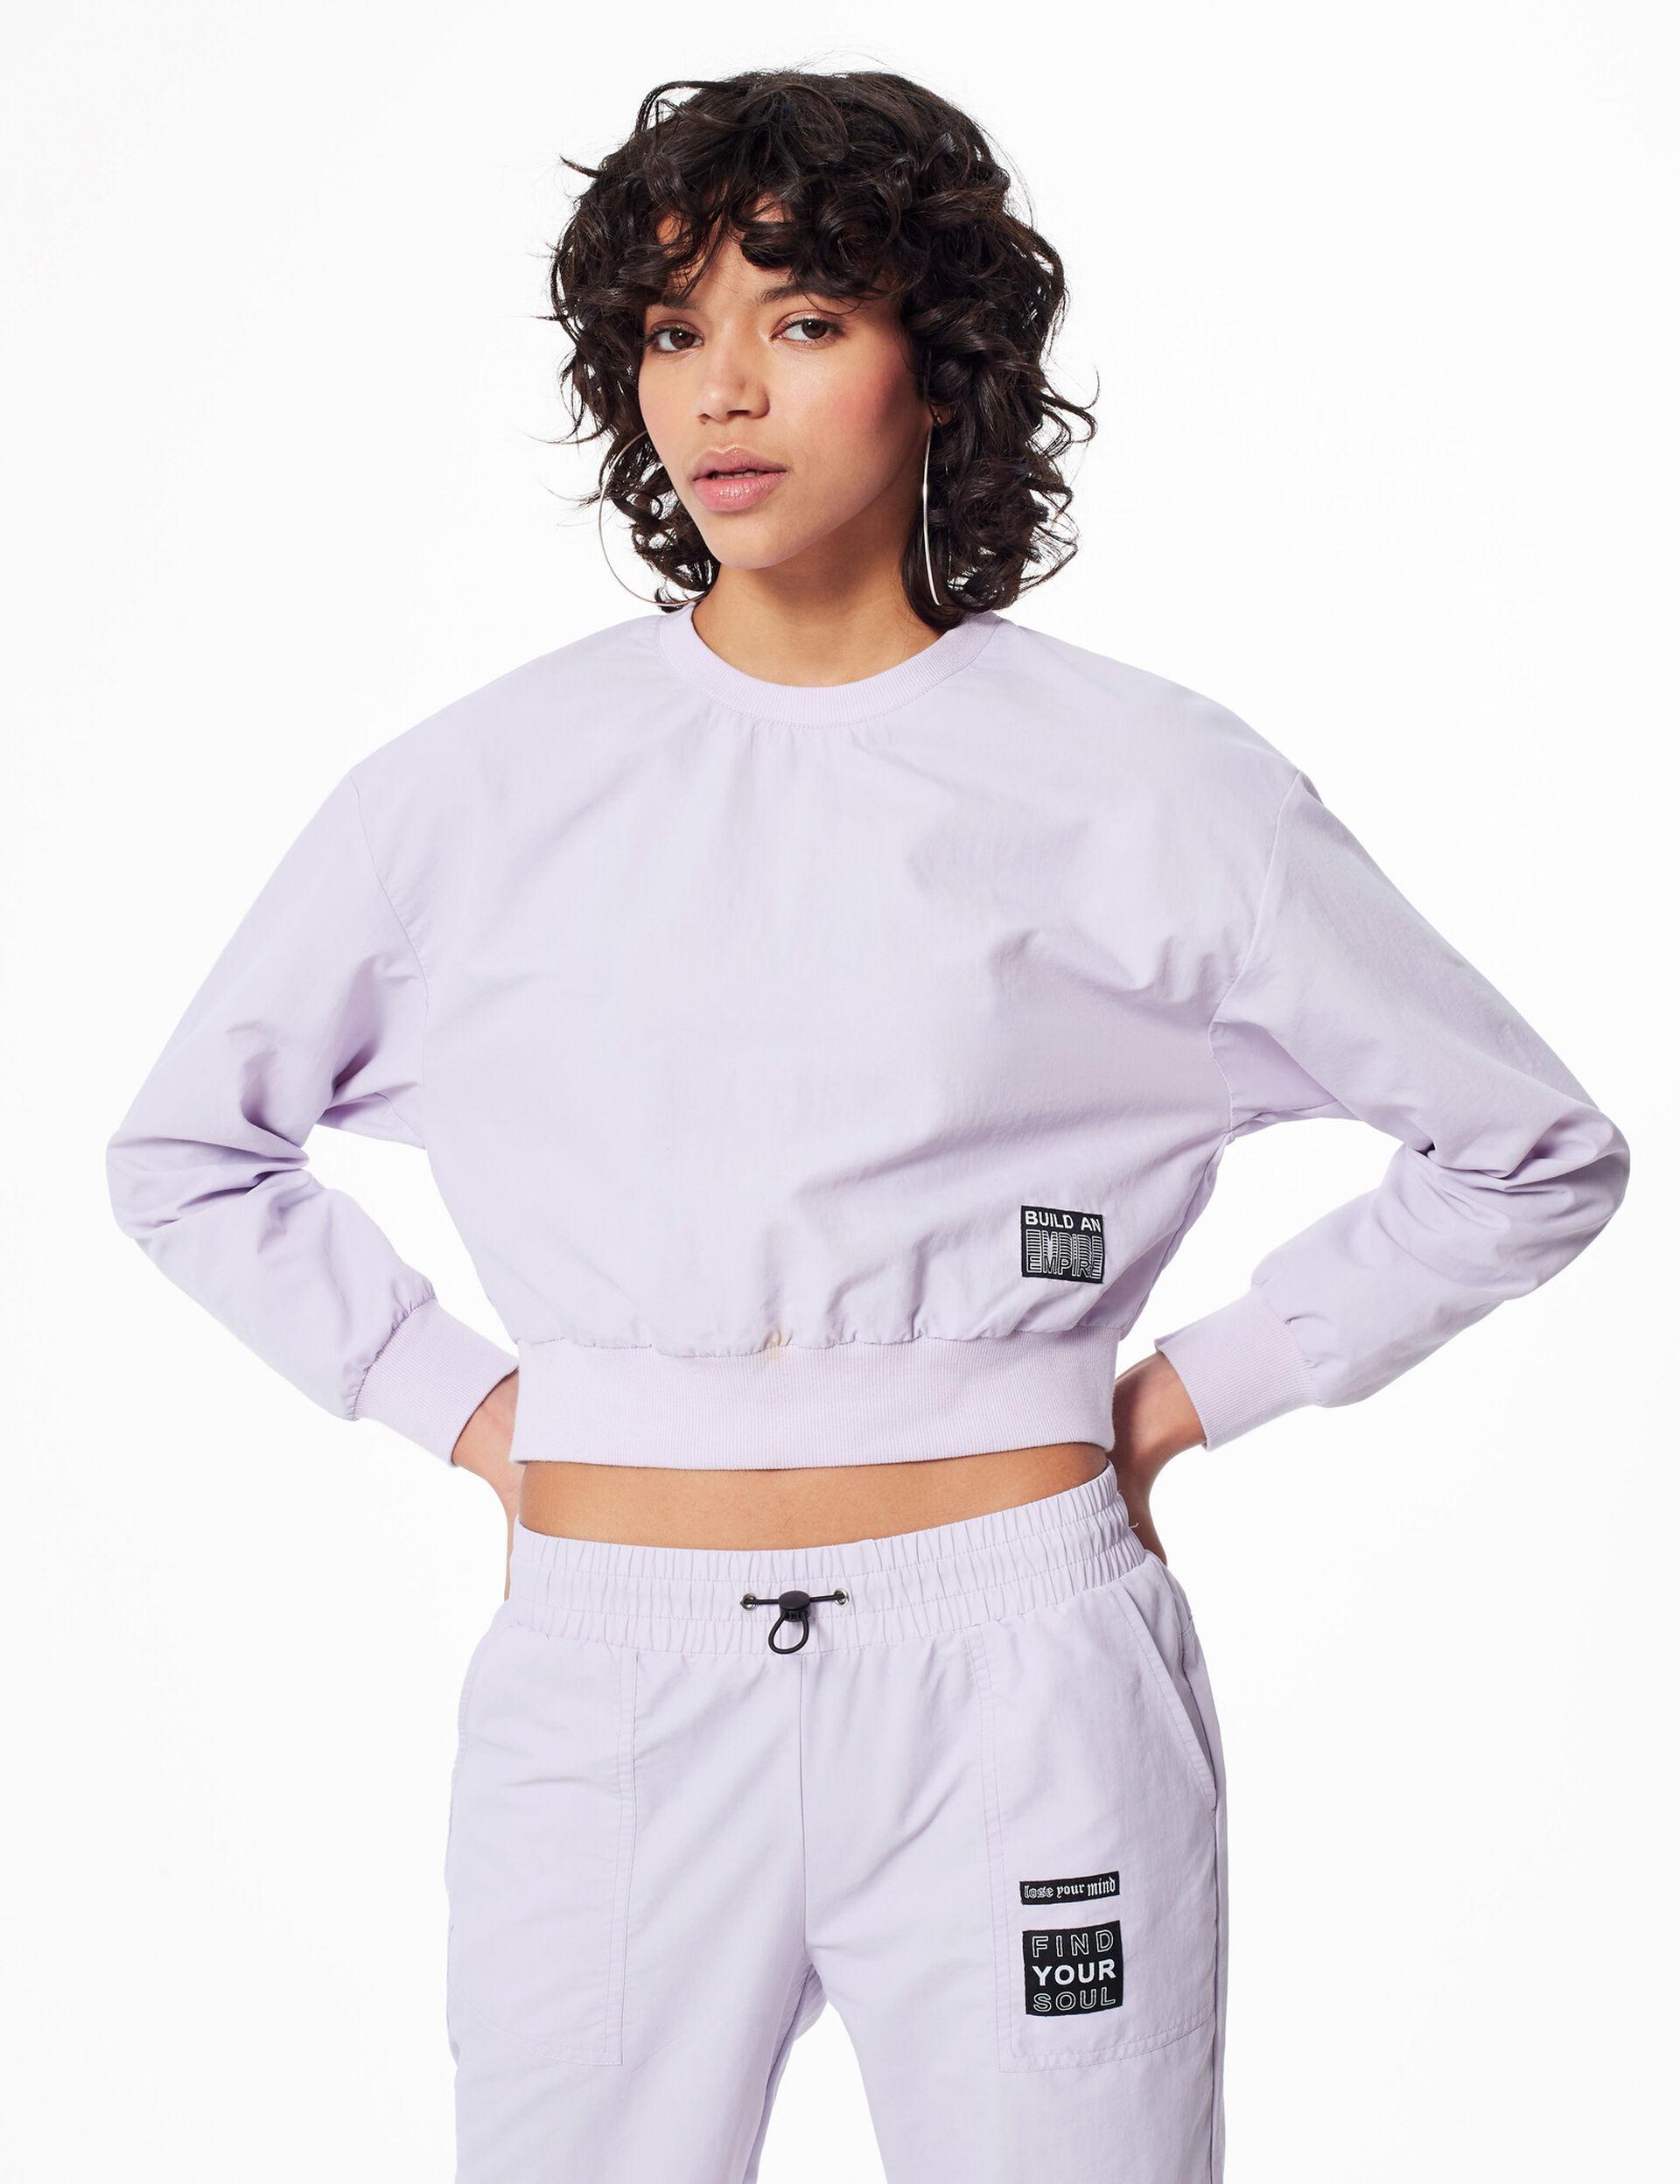 Waterproof sweatshirt